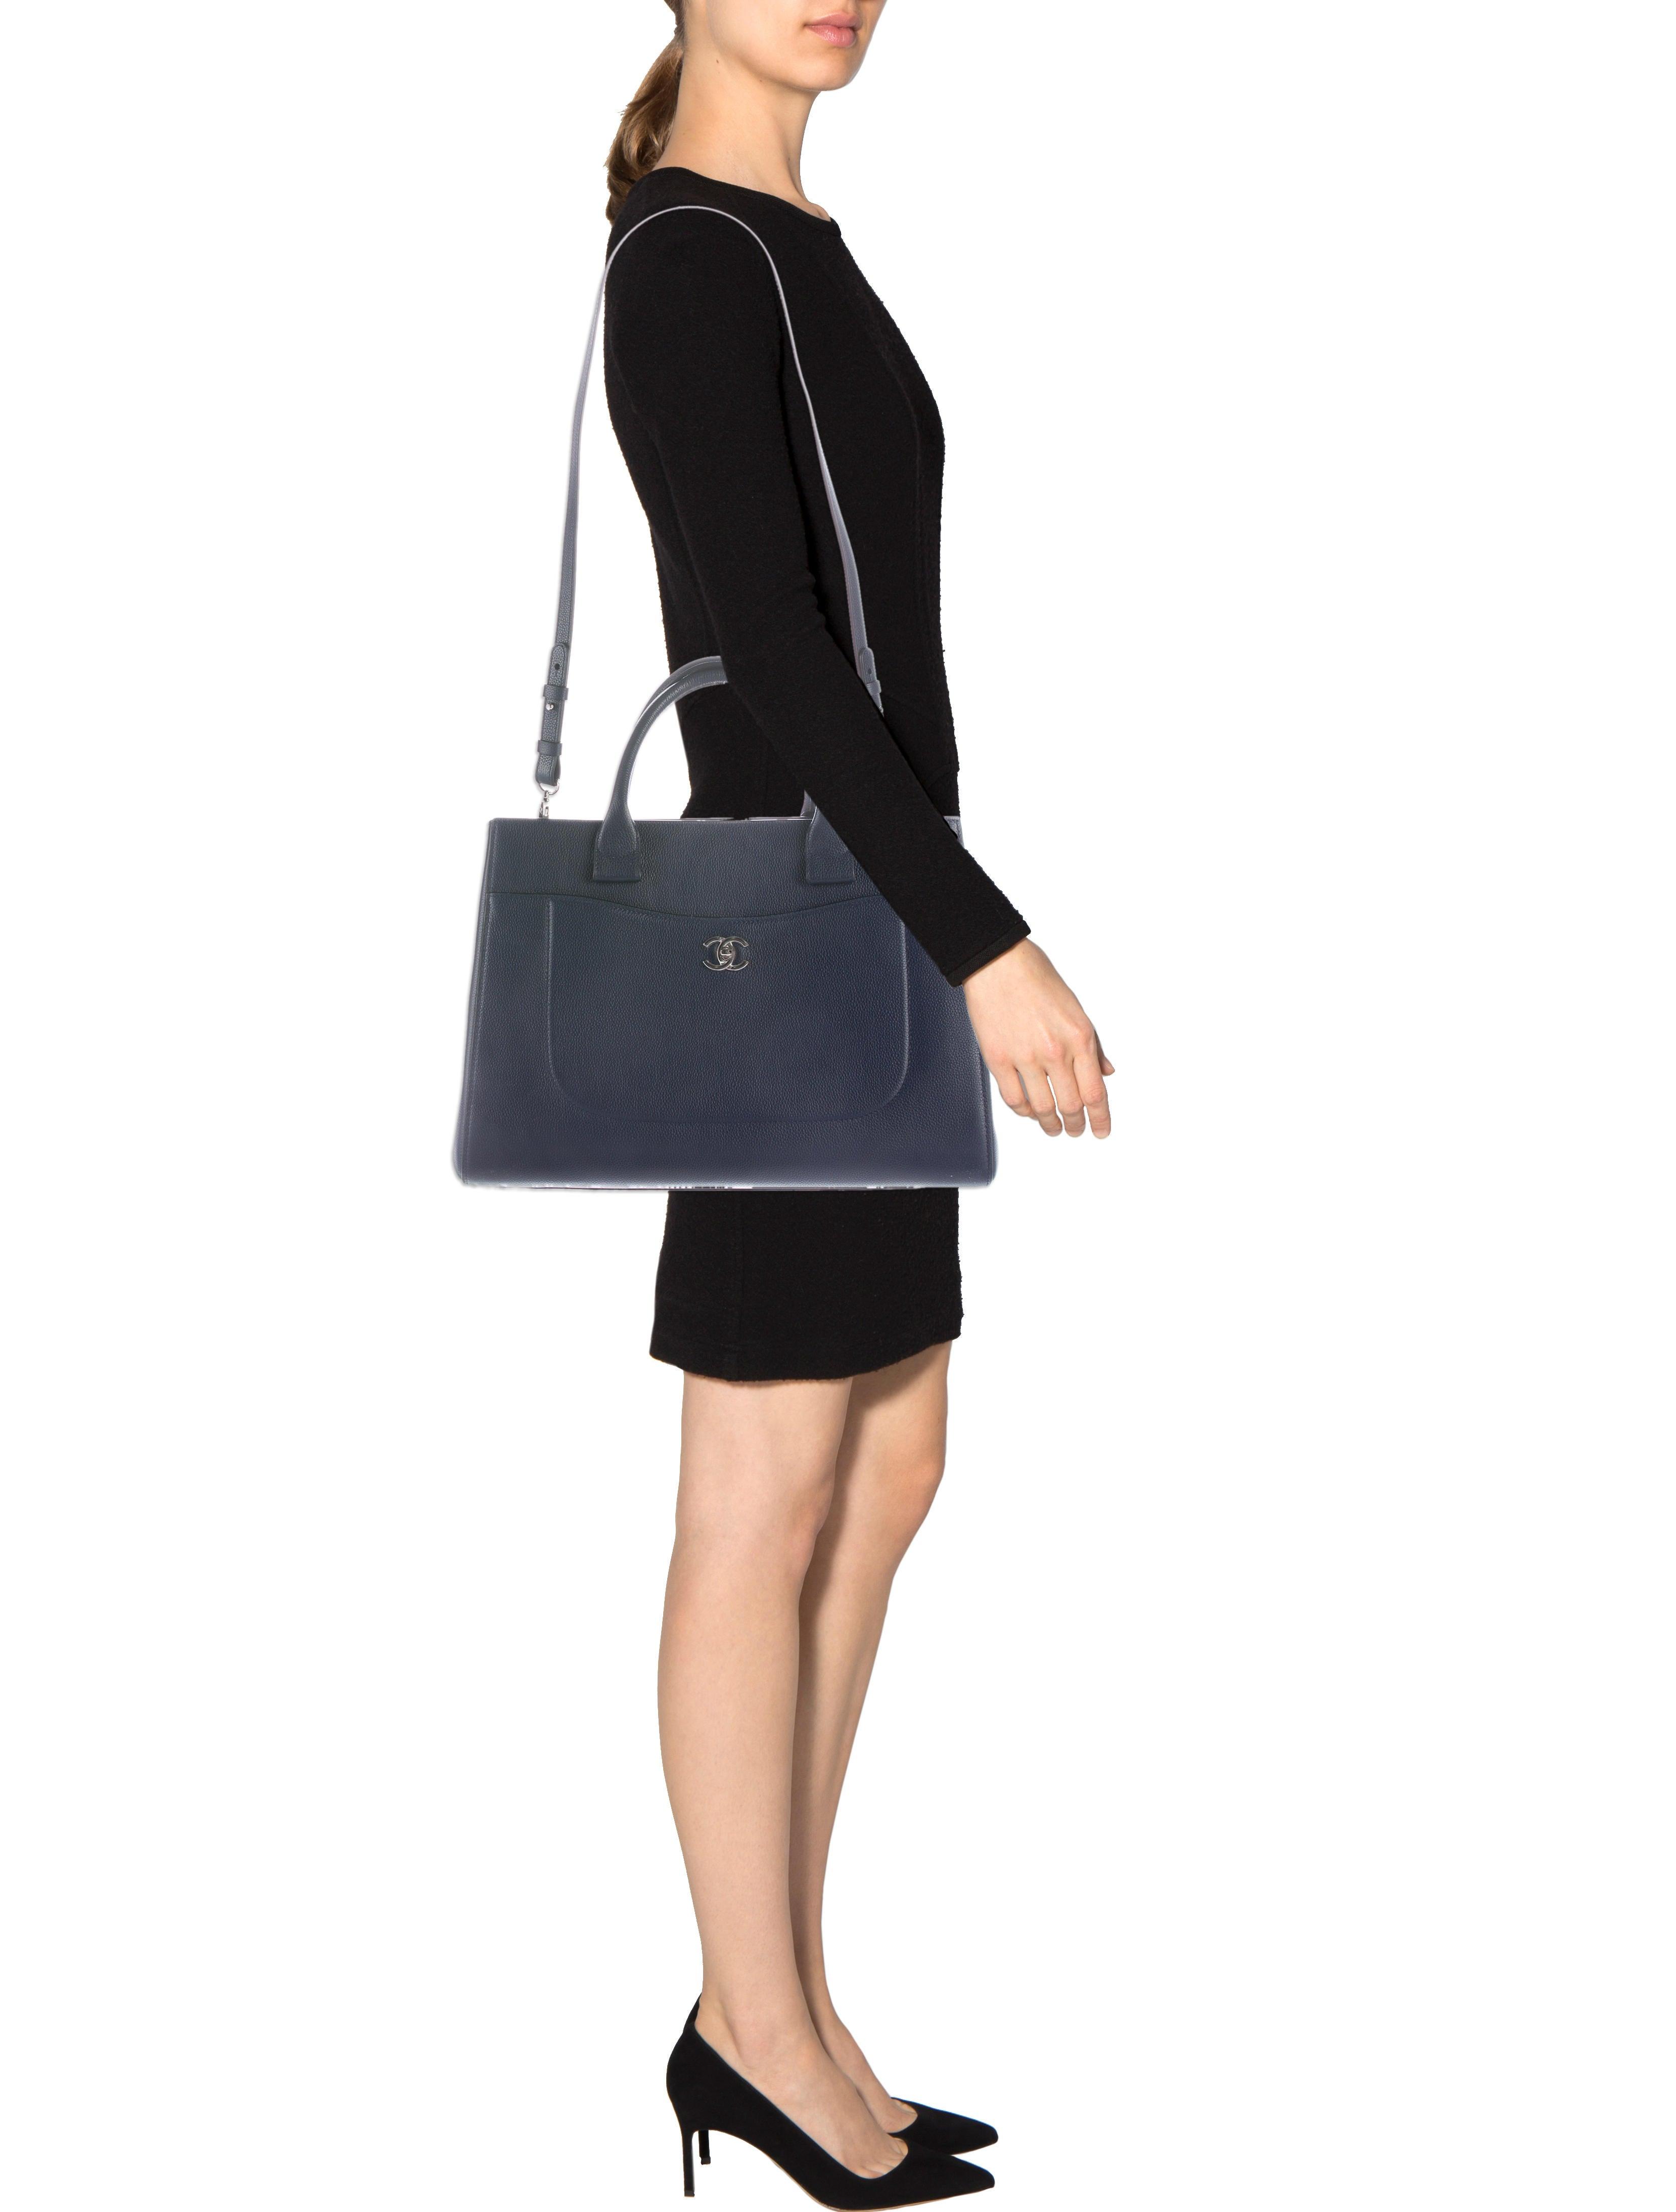 Chanel 2017 Large Neo Executive Shopping Tote Handbags